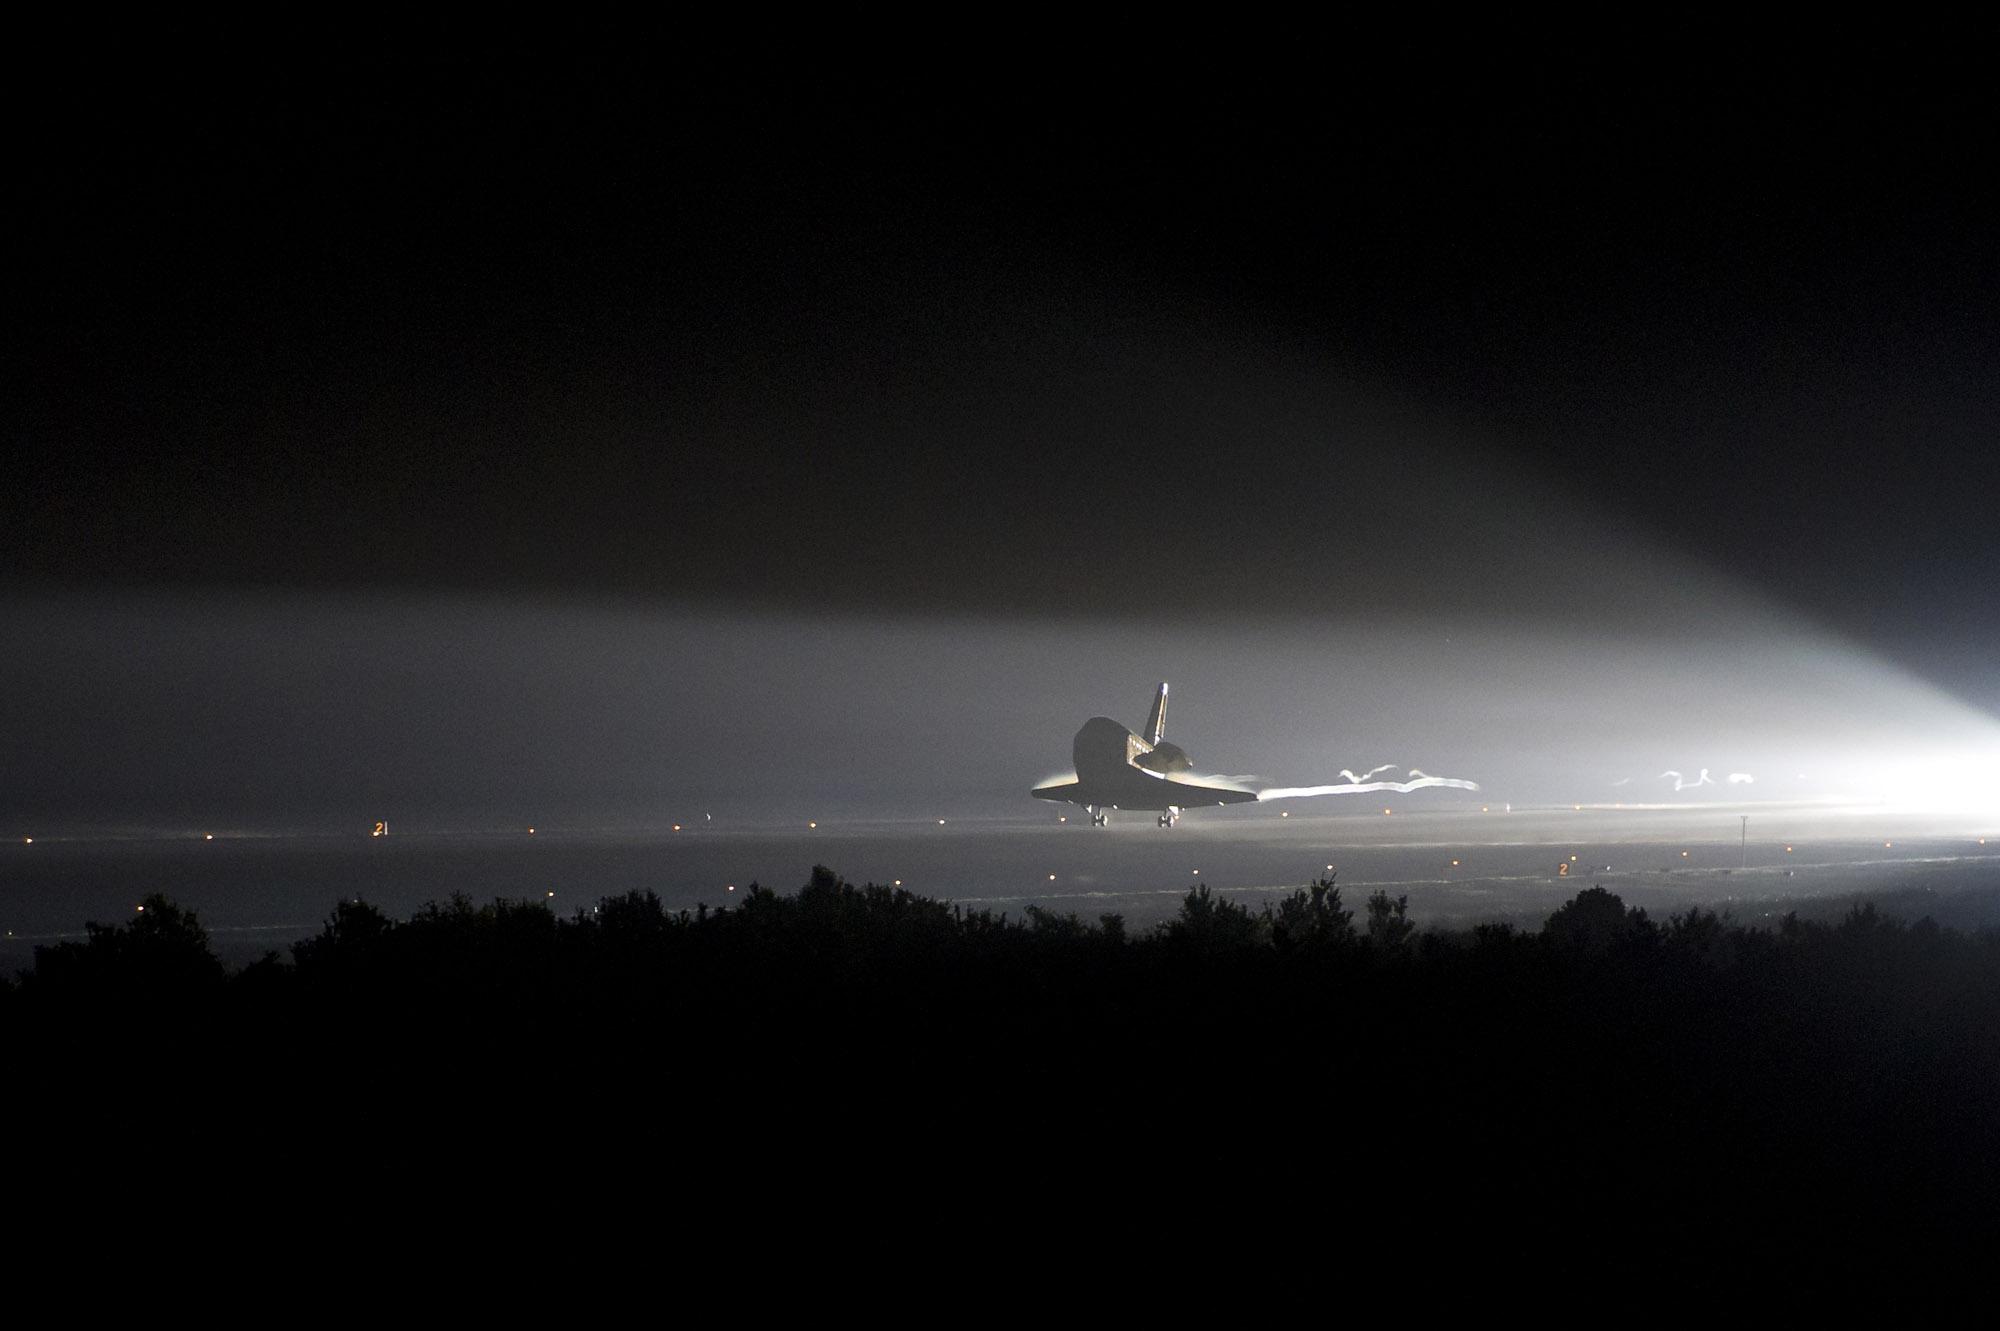 Shuttle Endeavour's Final Trip Home